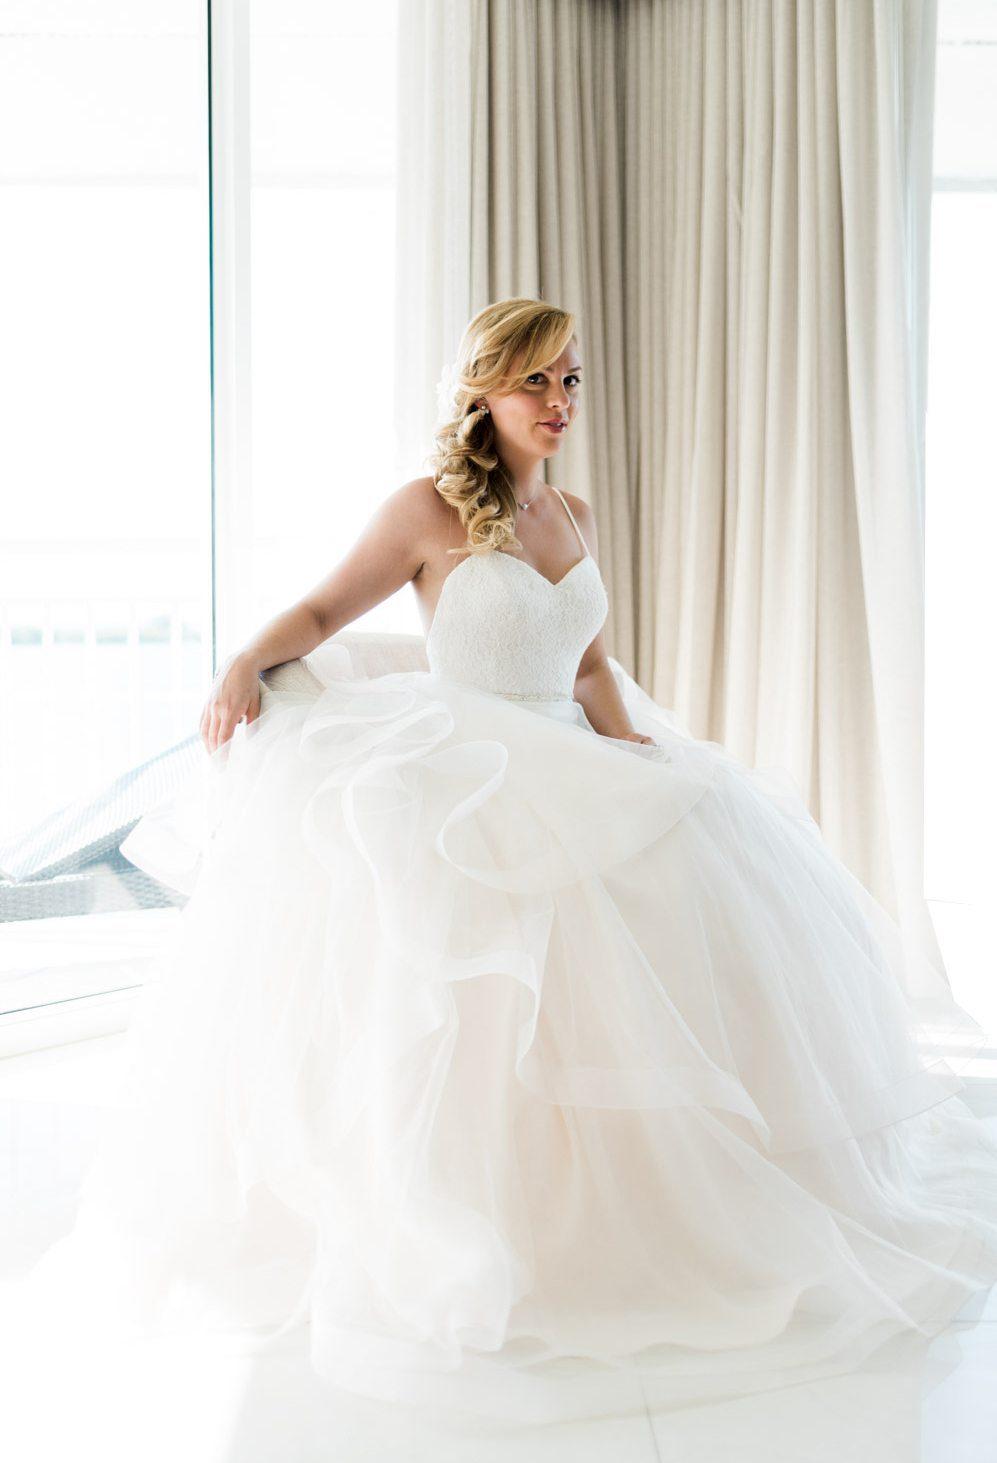 Feature Image 1 - Kate & Brian   Key West Wedding Photographer   West Martello